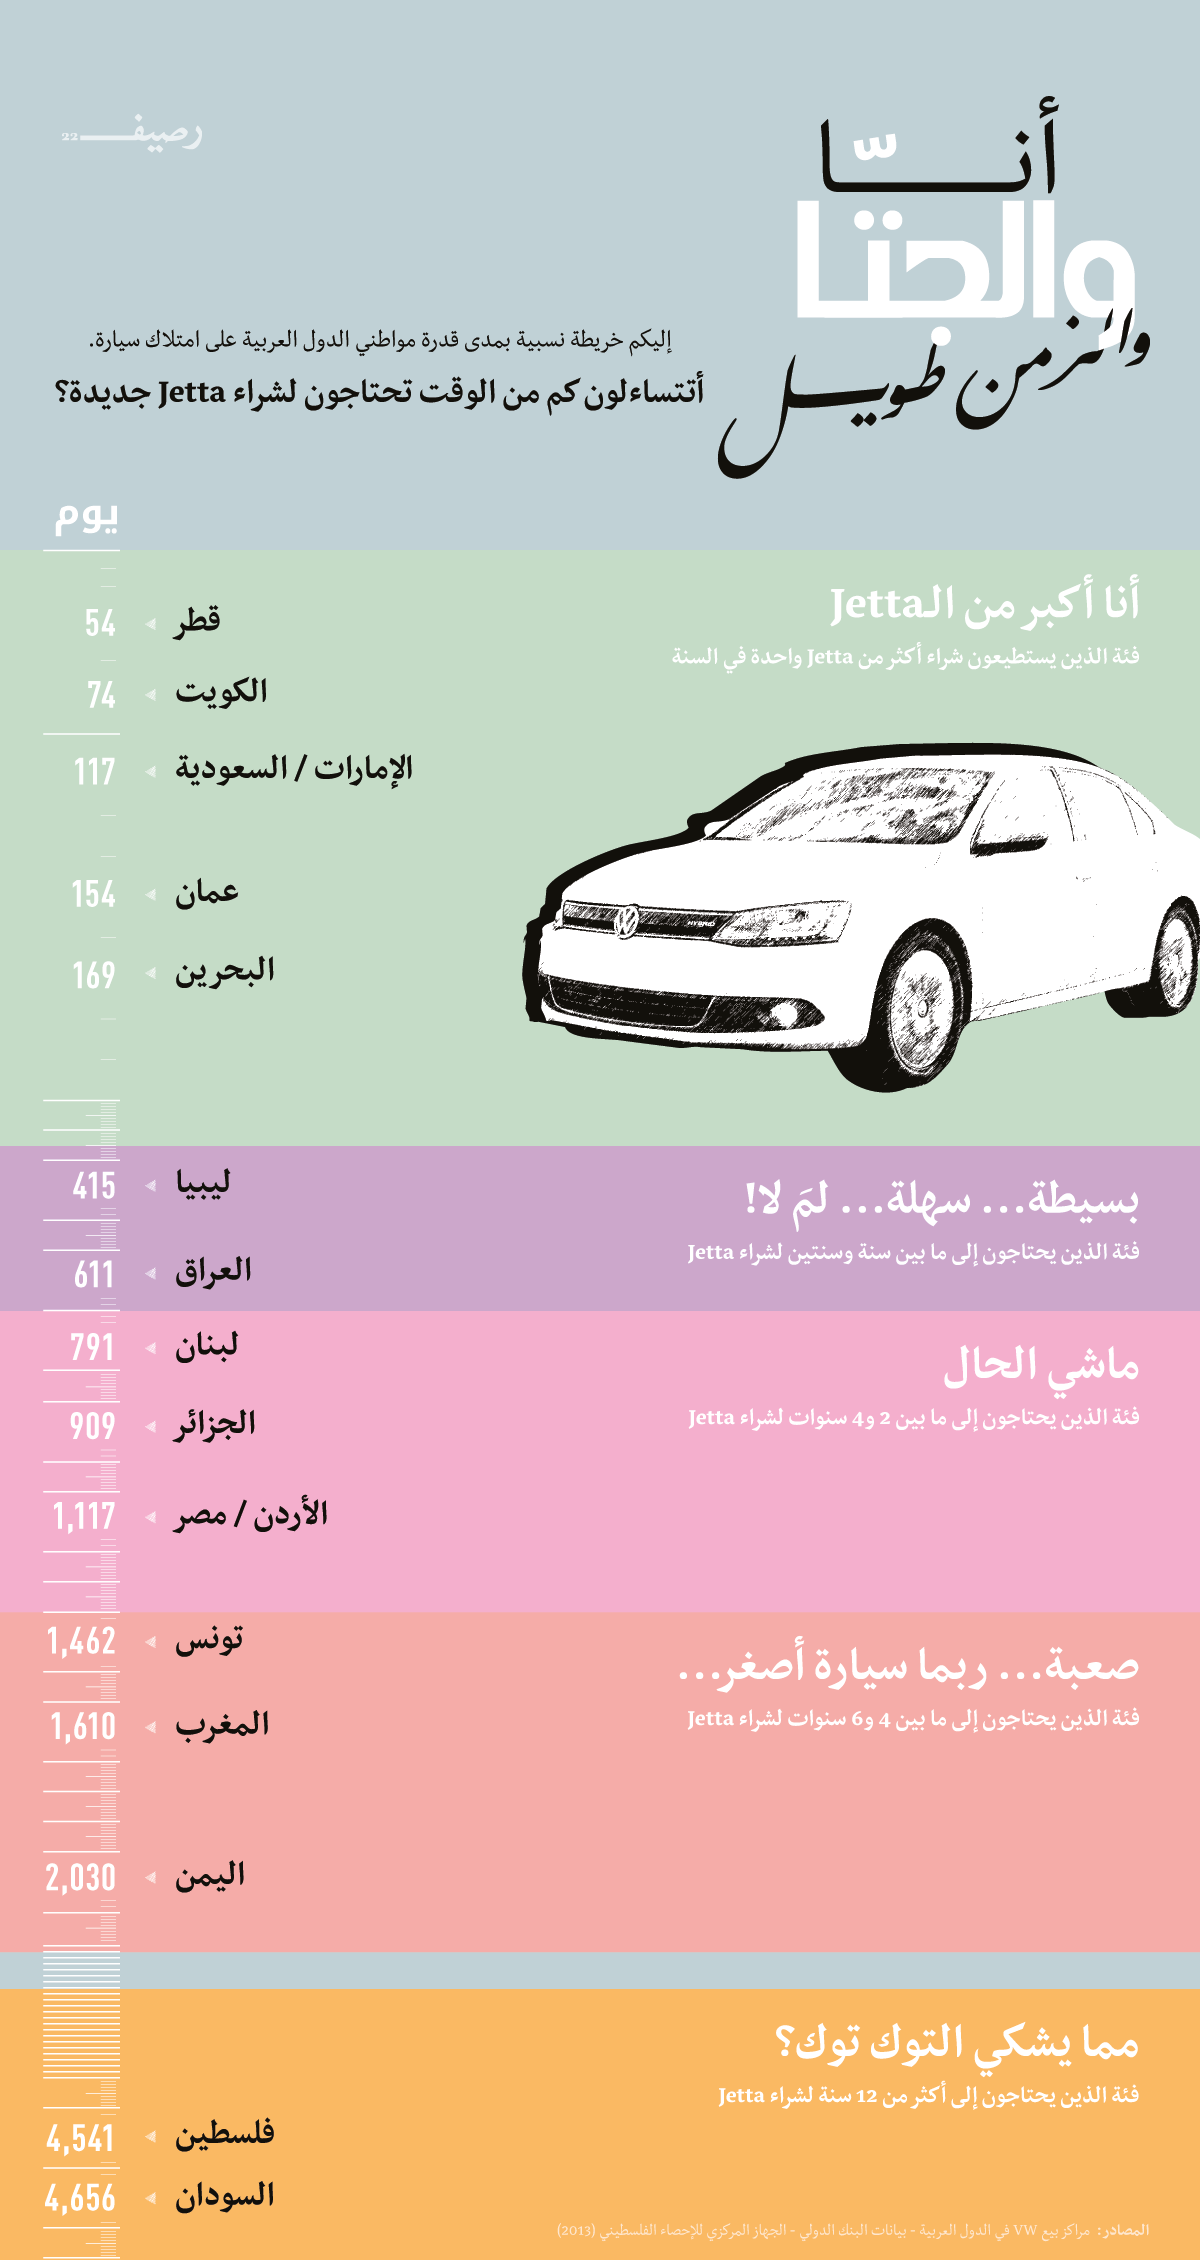 R22_Jetta_Index_infograph_20150314